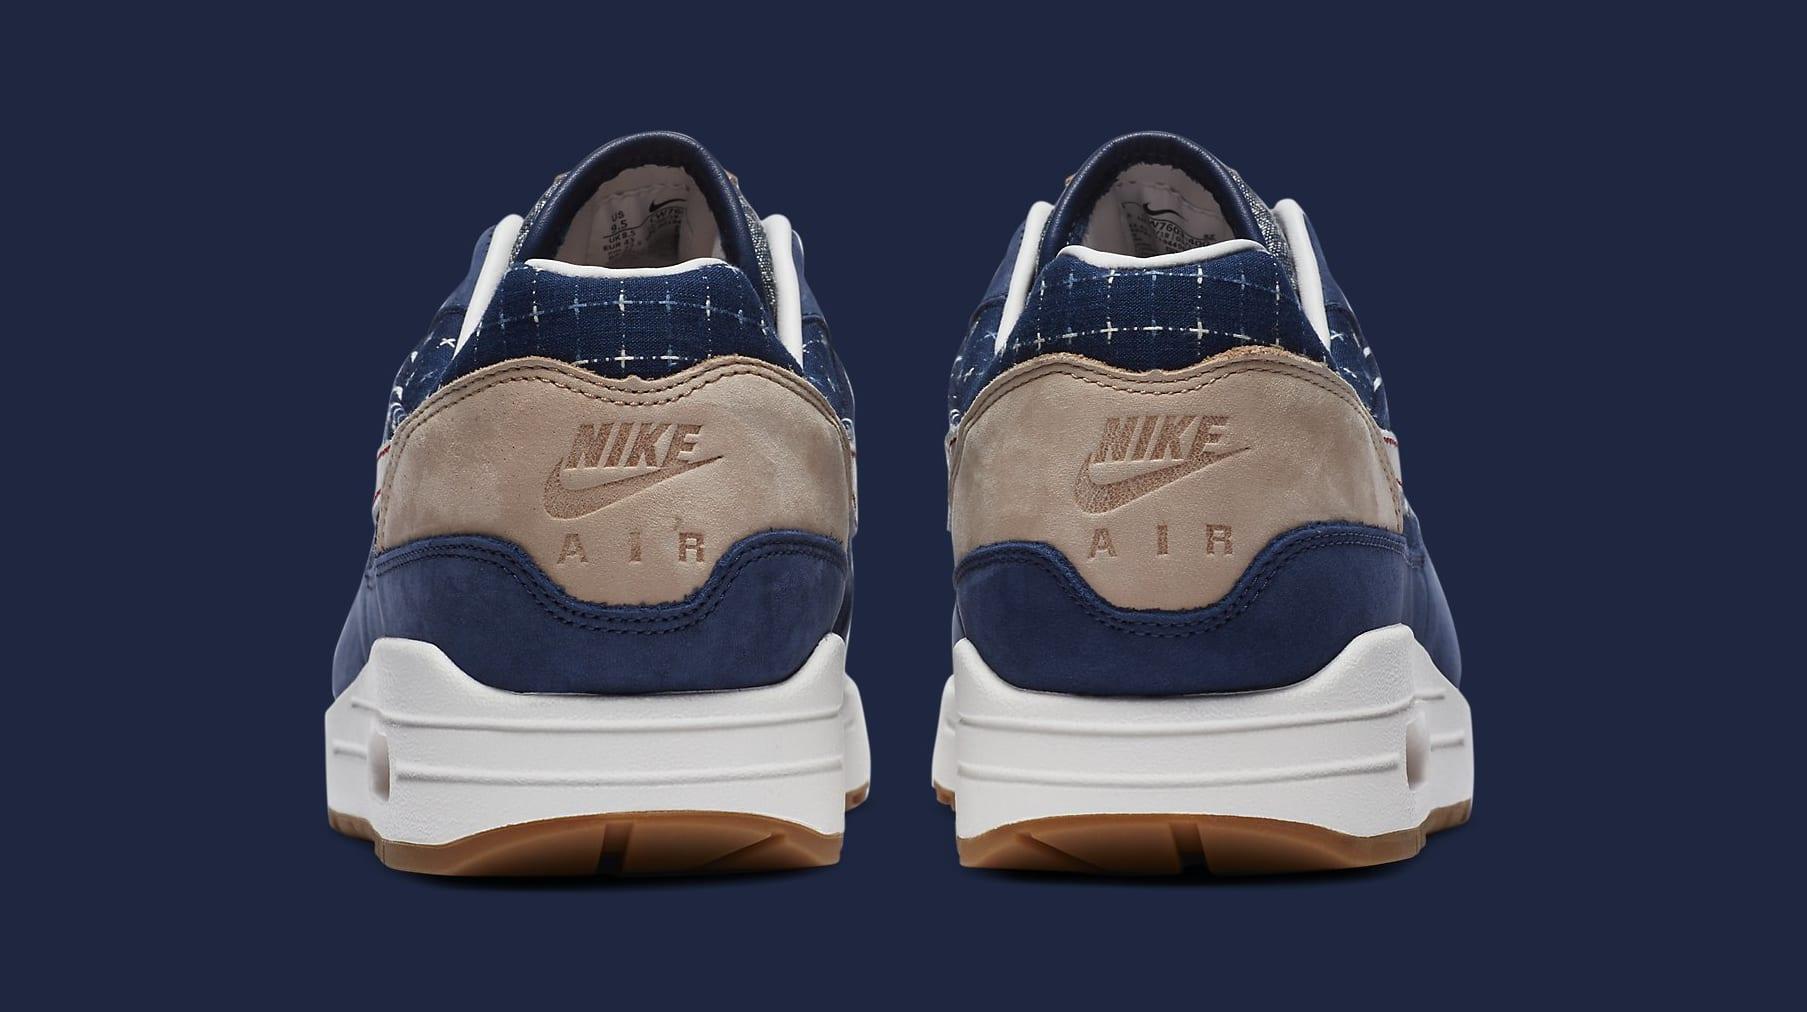 Denham x Nike Air Max 1 CW7603-400 Heel